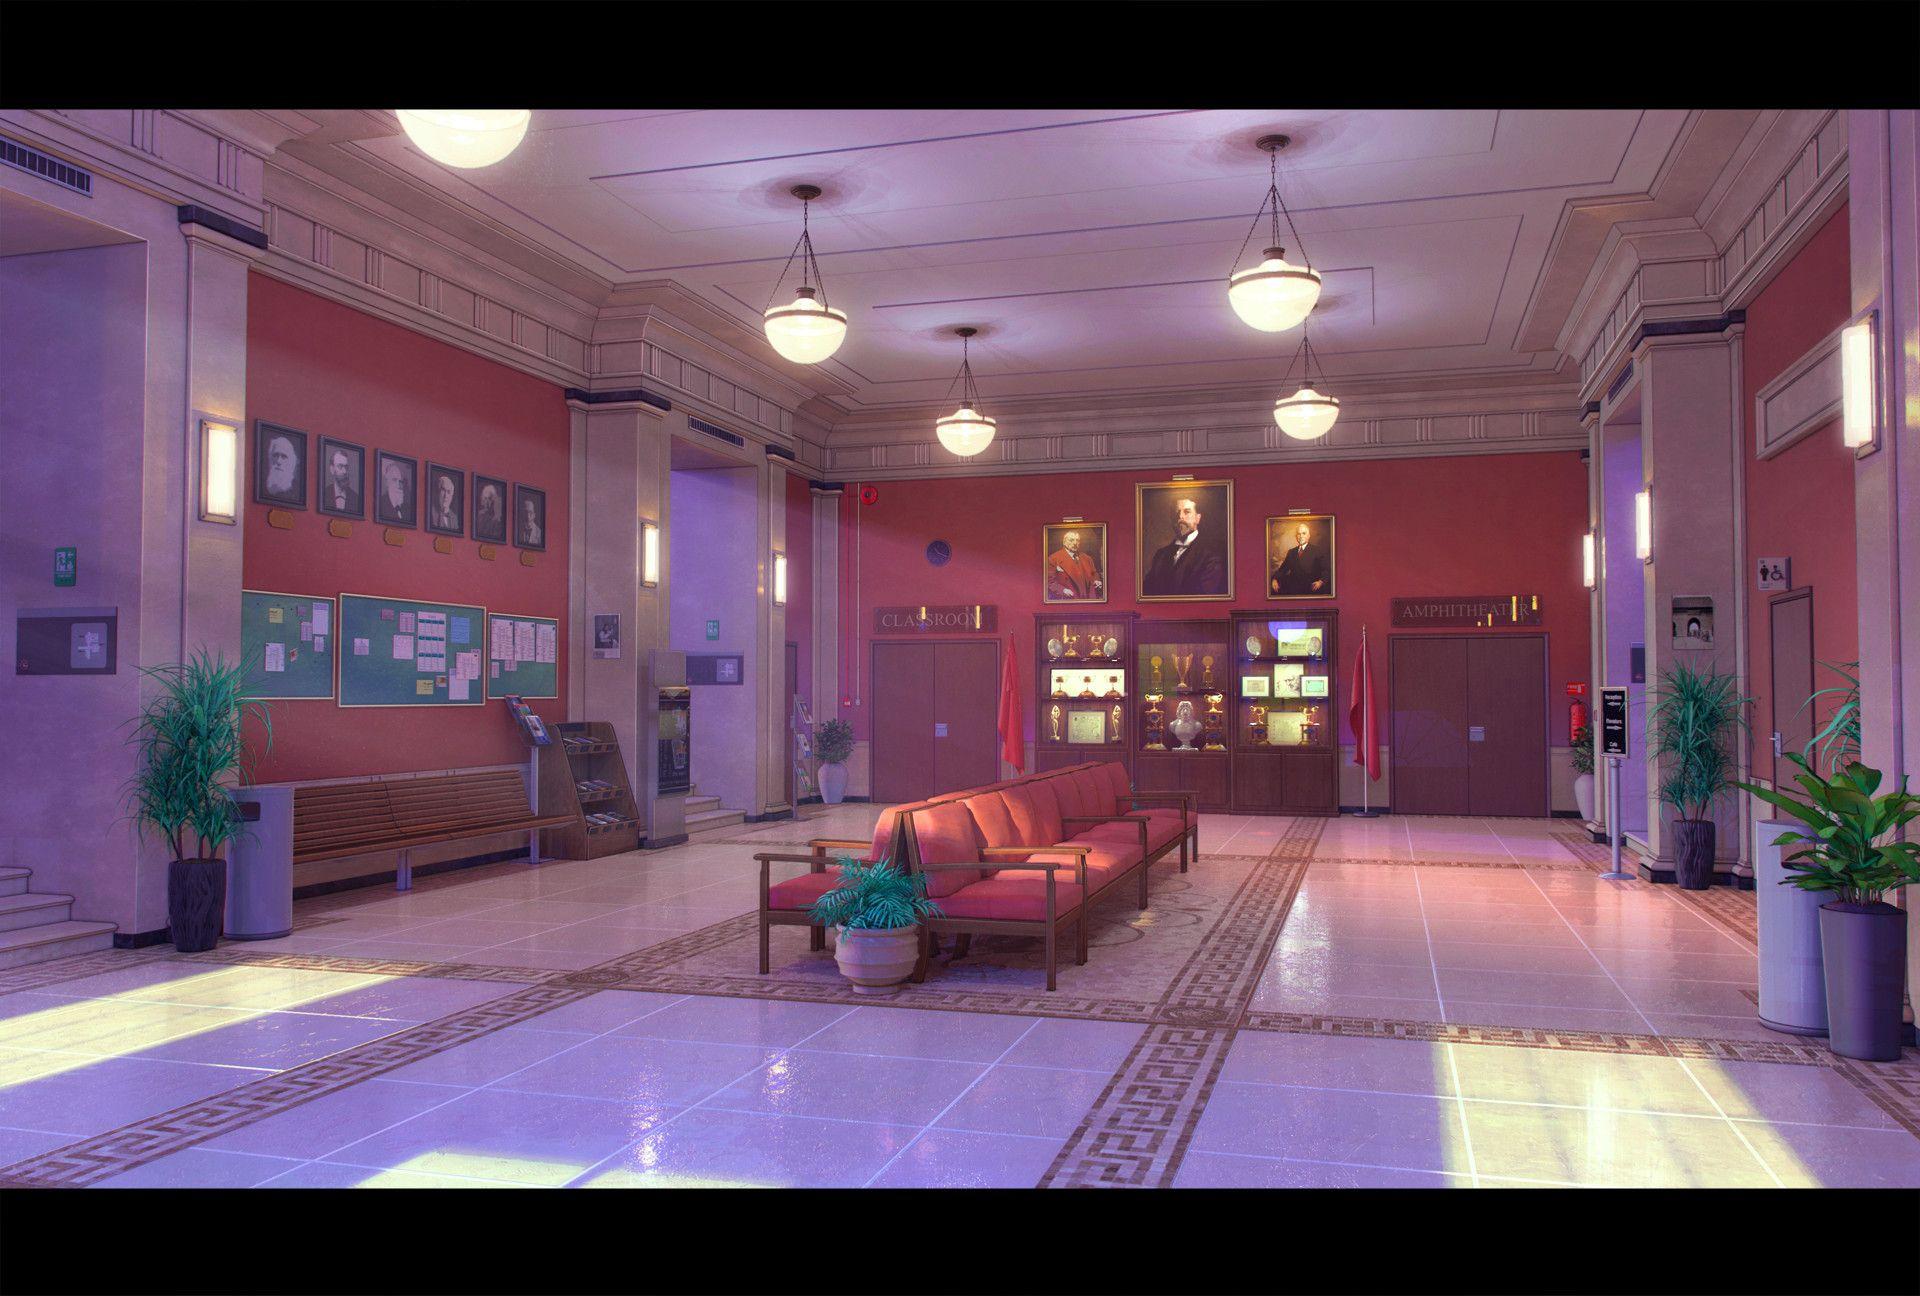 University Hall by Goliat Gashi in 2020 Anime background